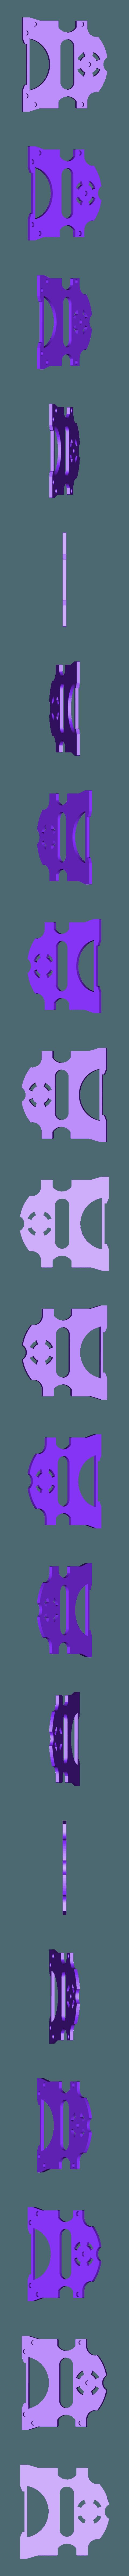 END.stl Download free STL file Plier tools modular desktop stand • 3D printable template, ICTAvatar